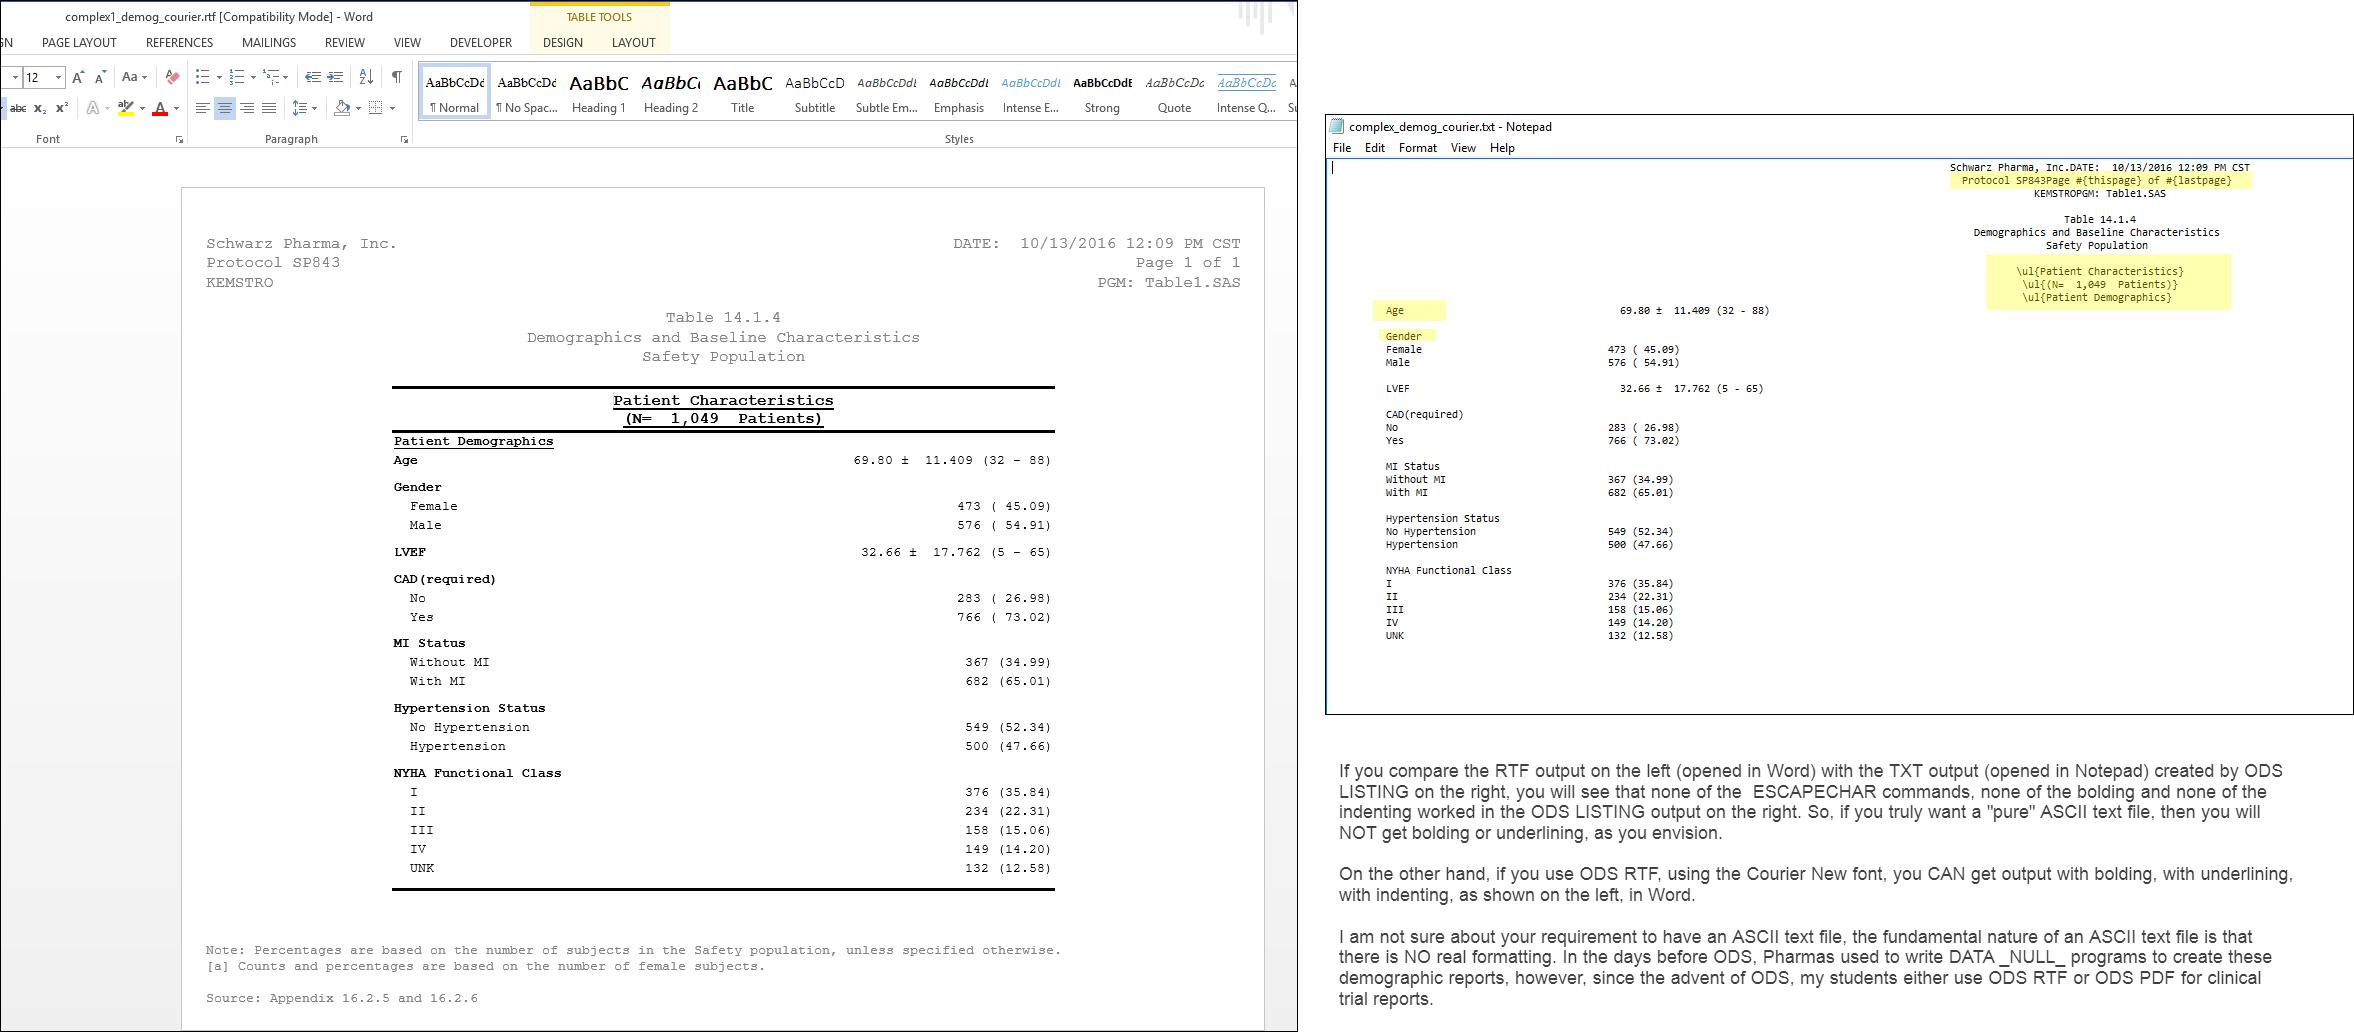 compare_rtf_listing.png